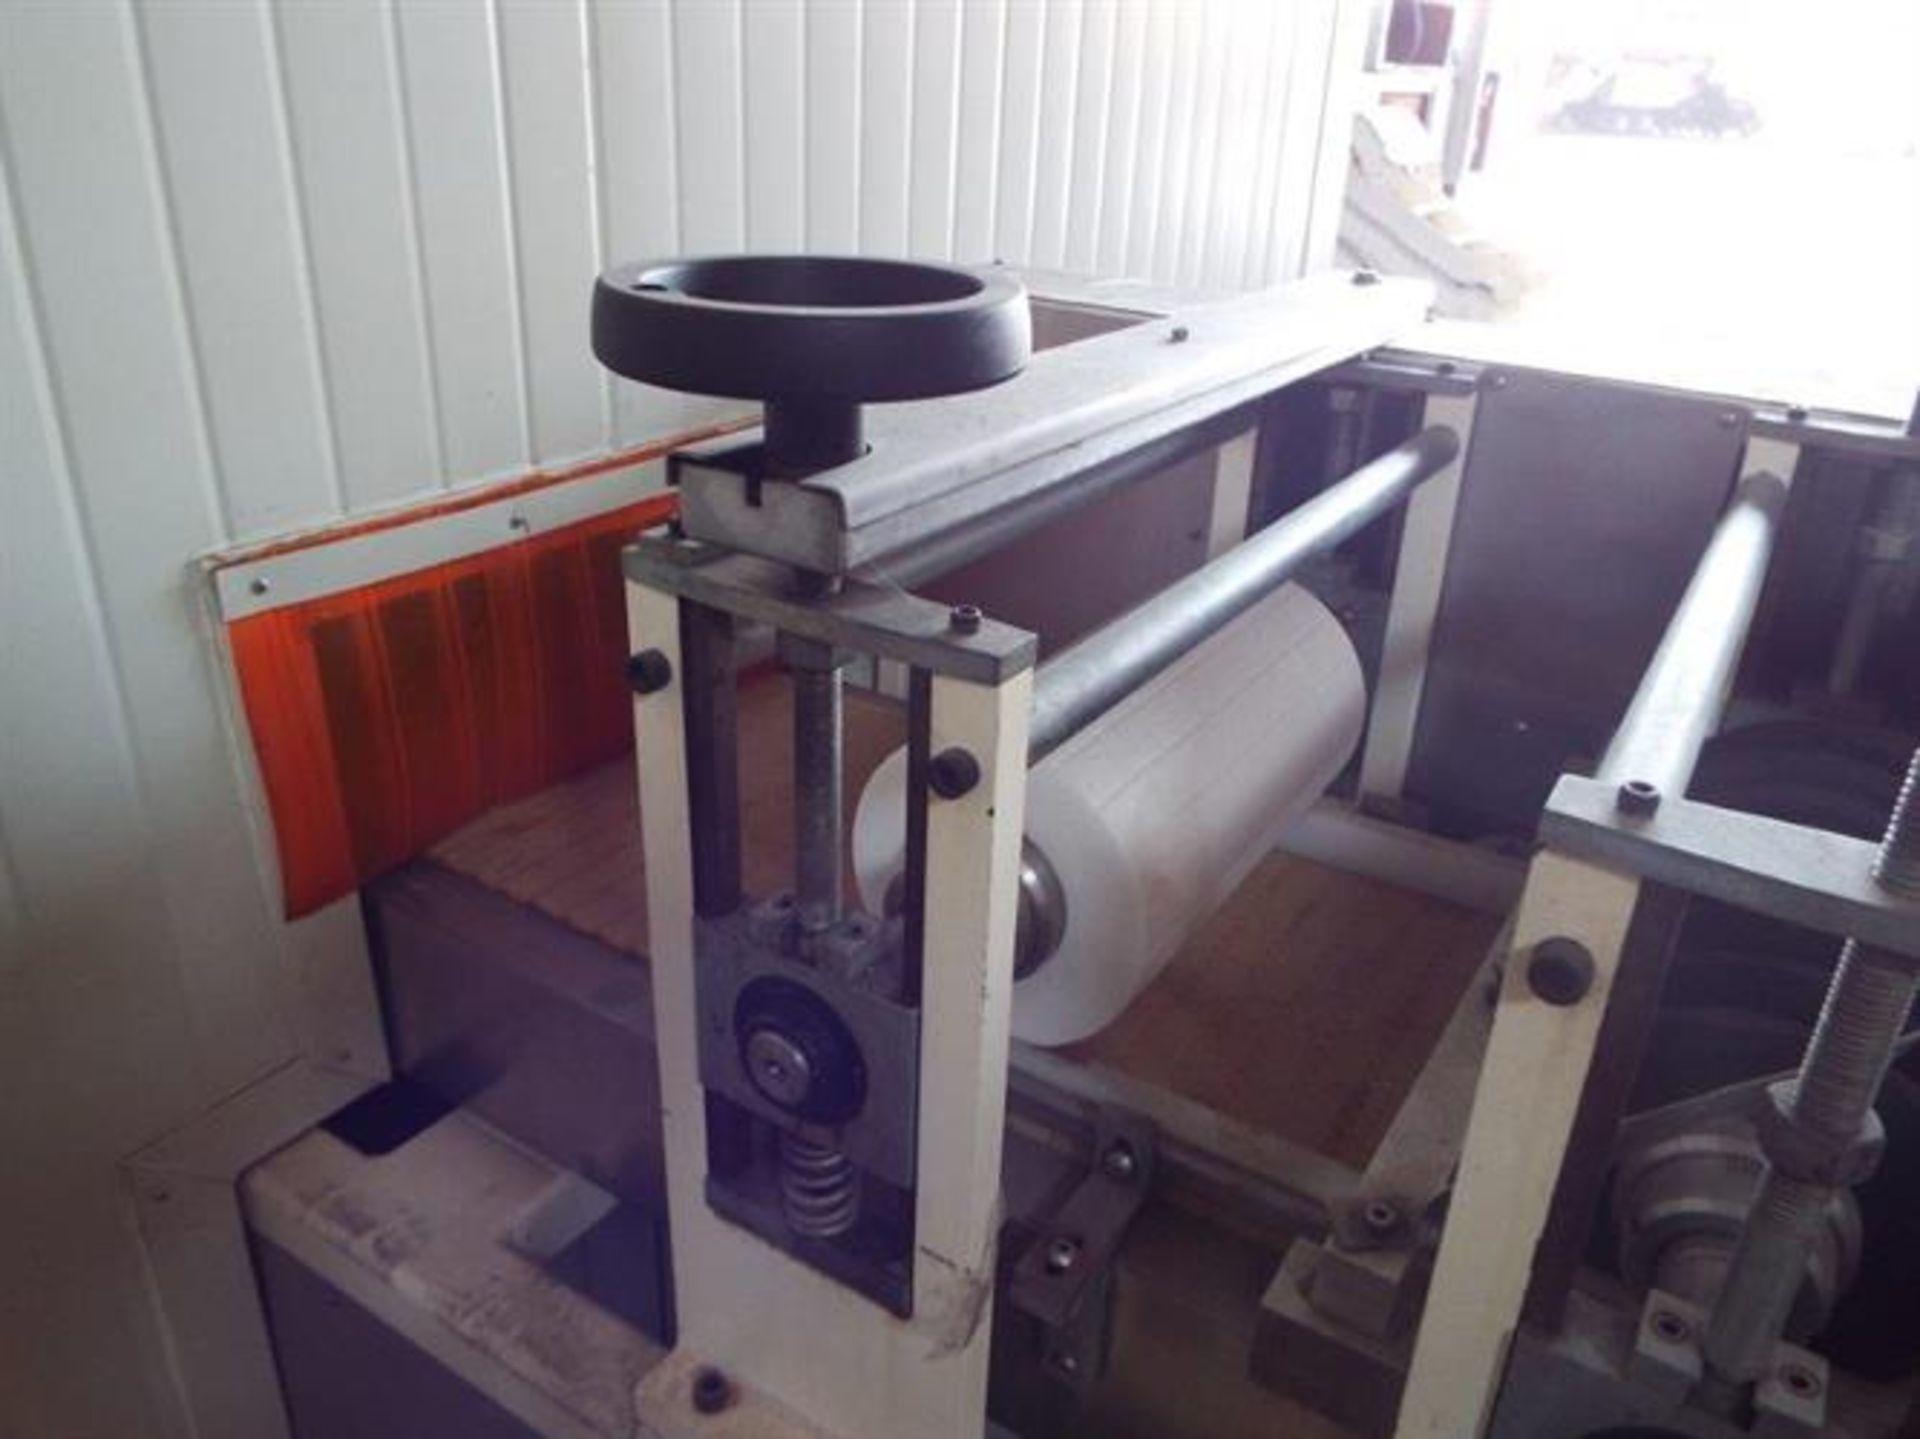 Tecmaq 290 mm Wide Slab Forming Line - Model TM-6H built 2012 - Three sets of gauging/sheeting - Image 16 of 30